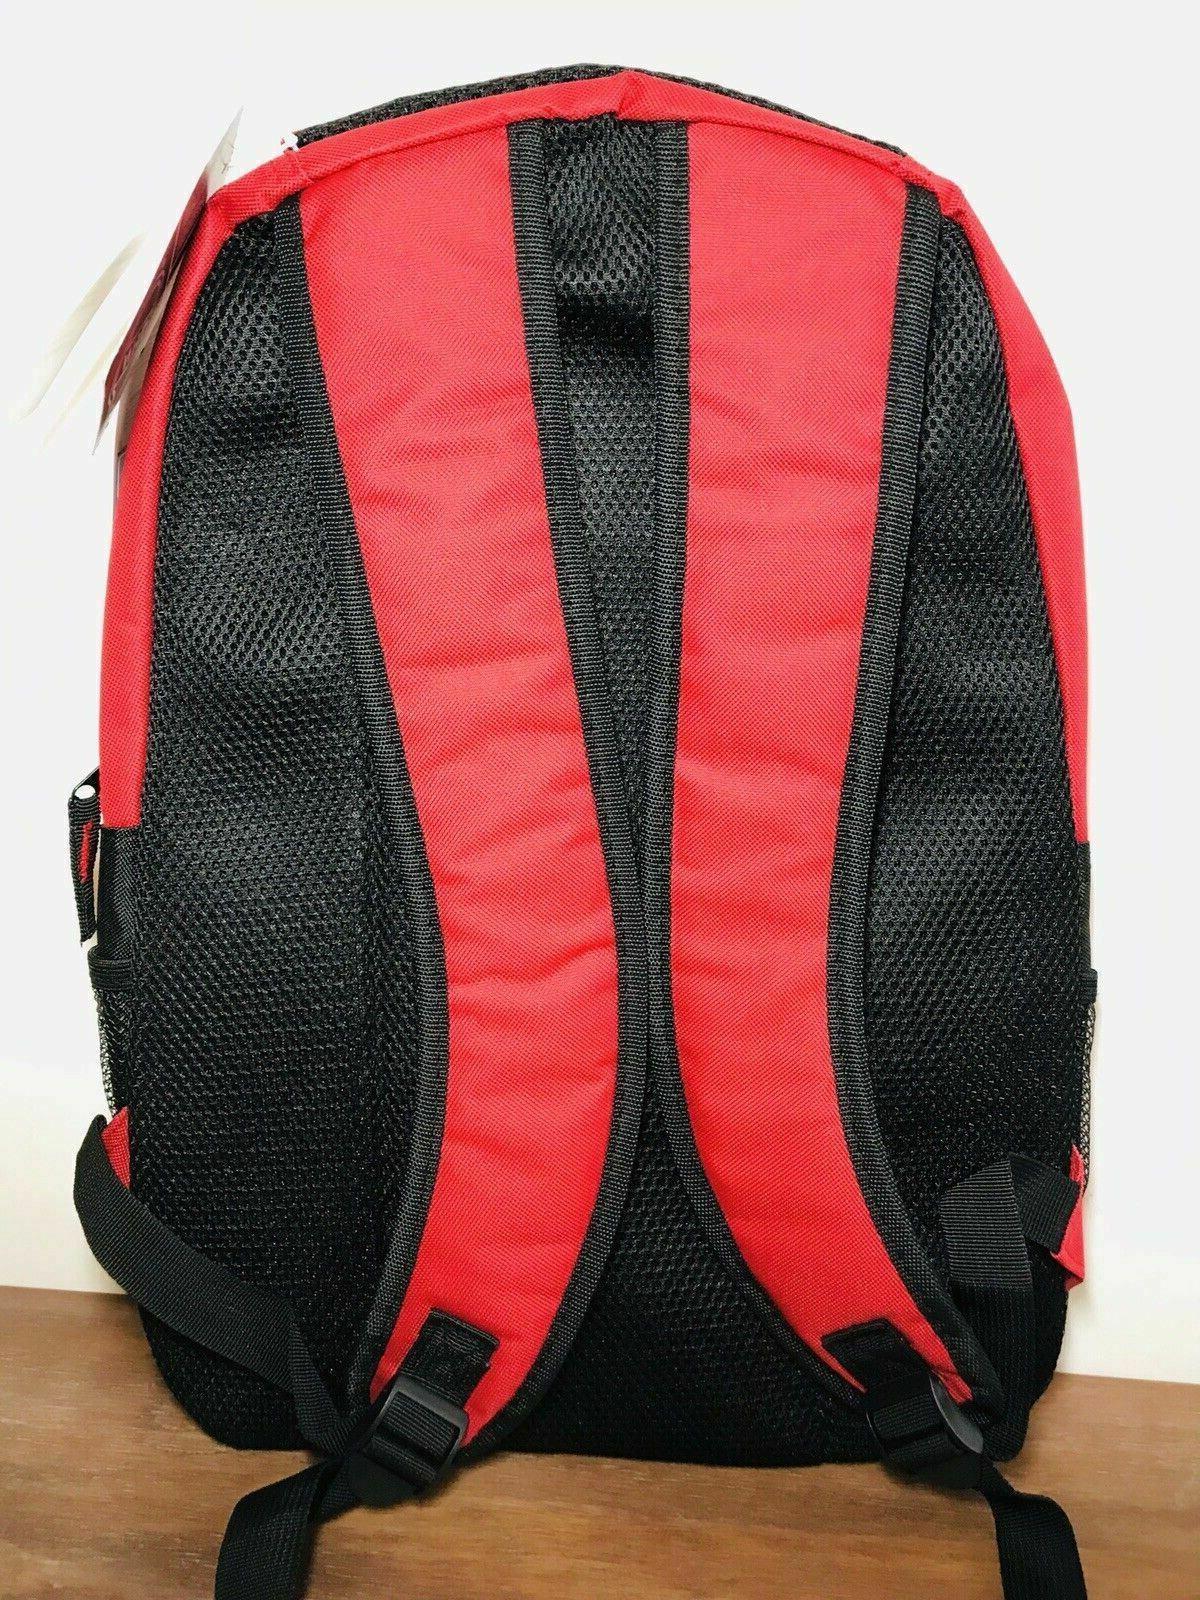 NHL Red Wings Backpack